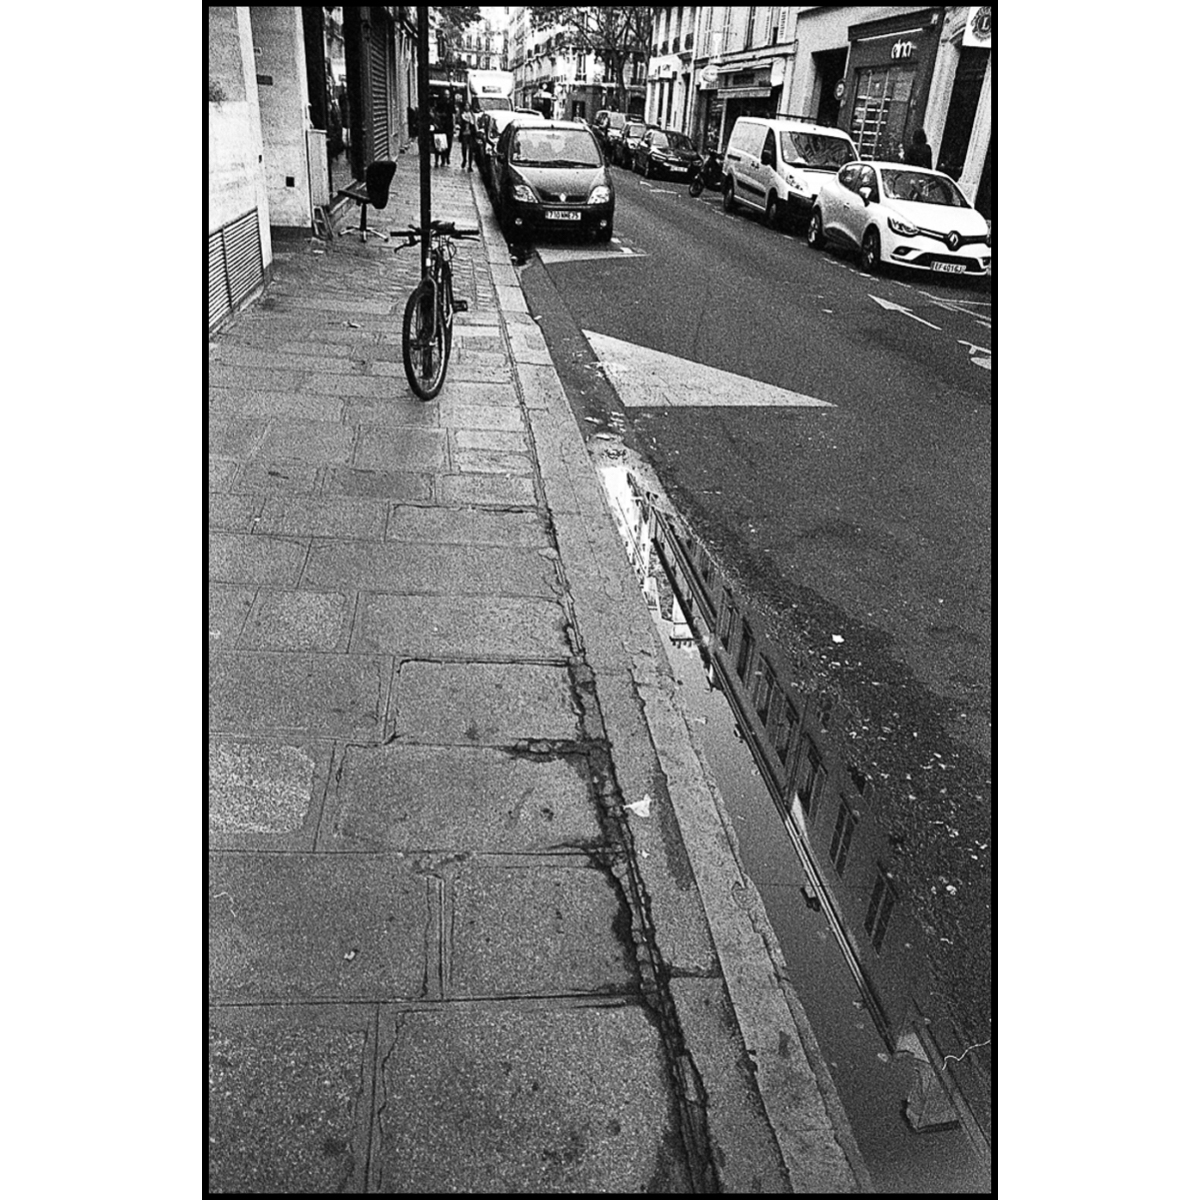 paris file-061.jpg